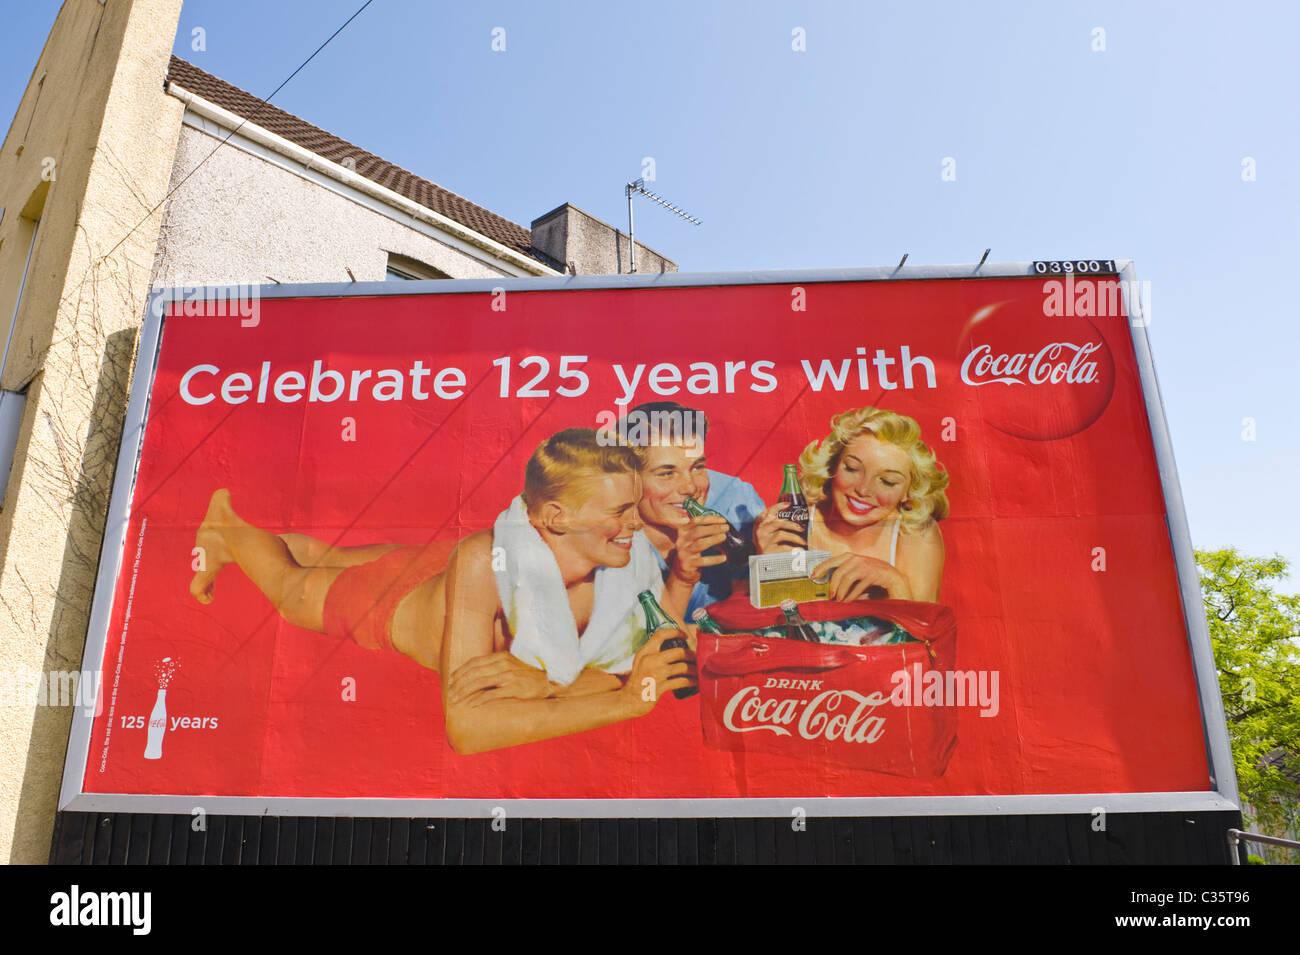 coca cola billboard stockfotos coca cola billboard bilder alamy. Black Bedroom Furniture Sets. Home Design Ideas